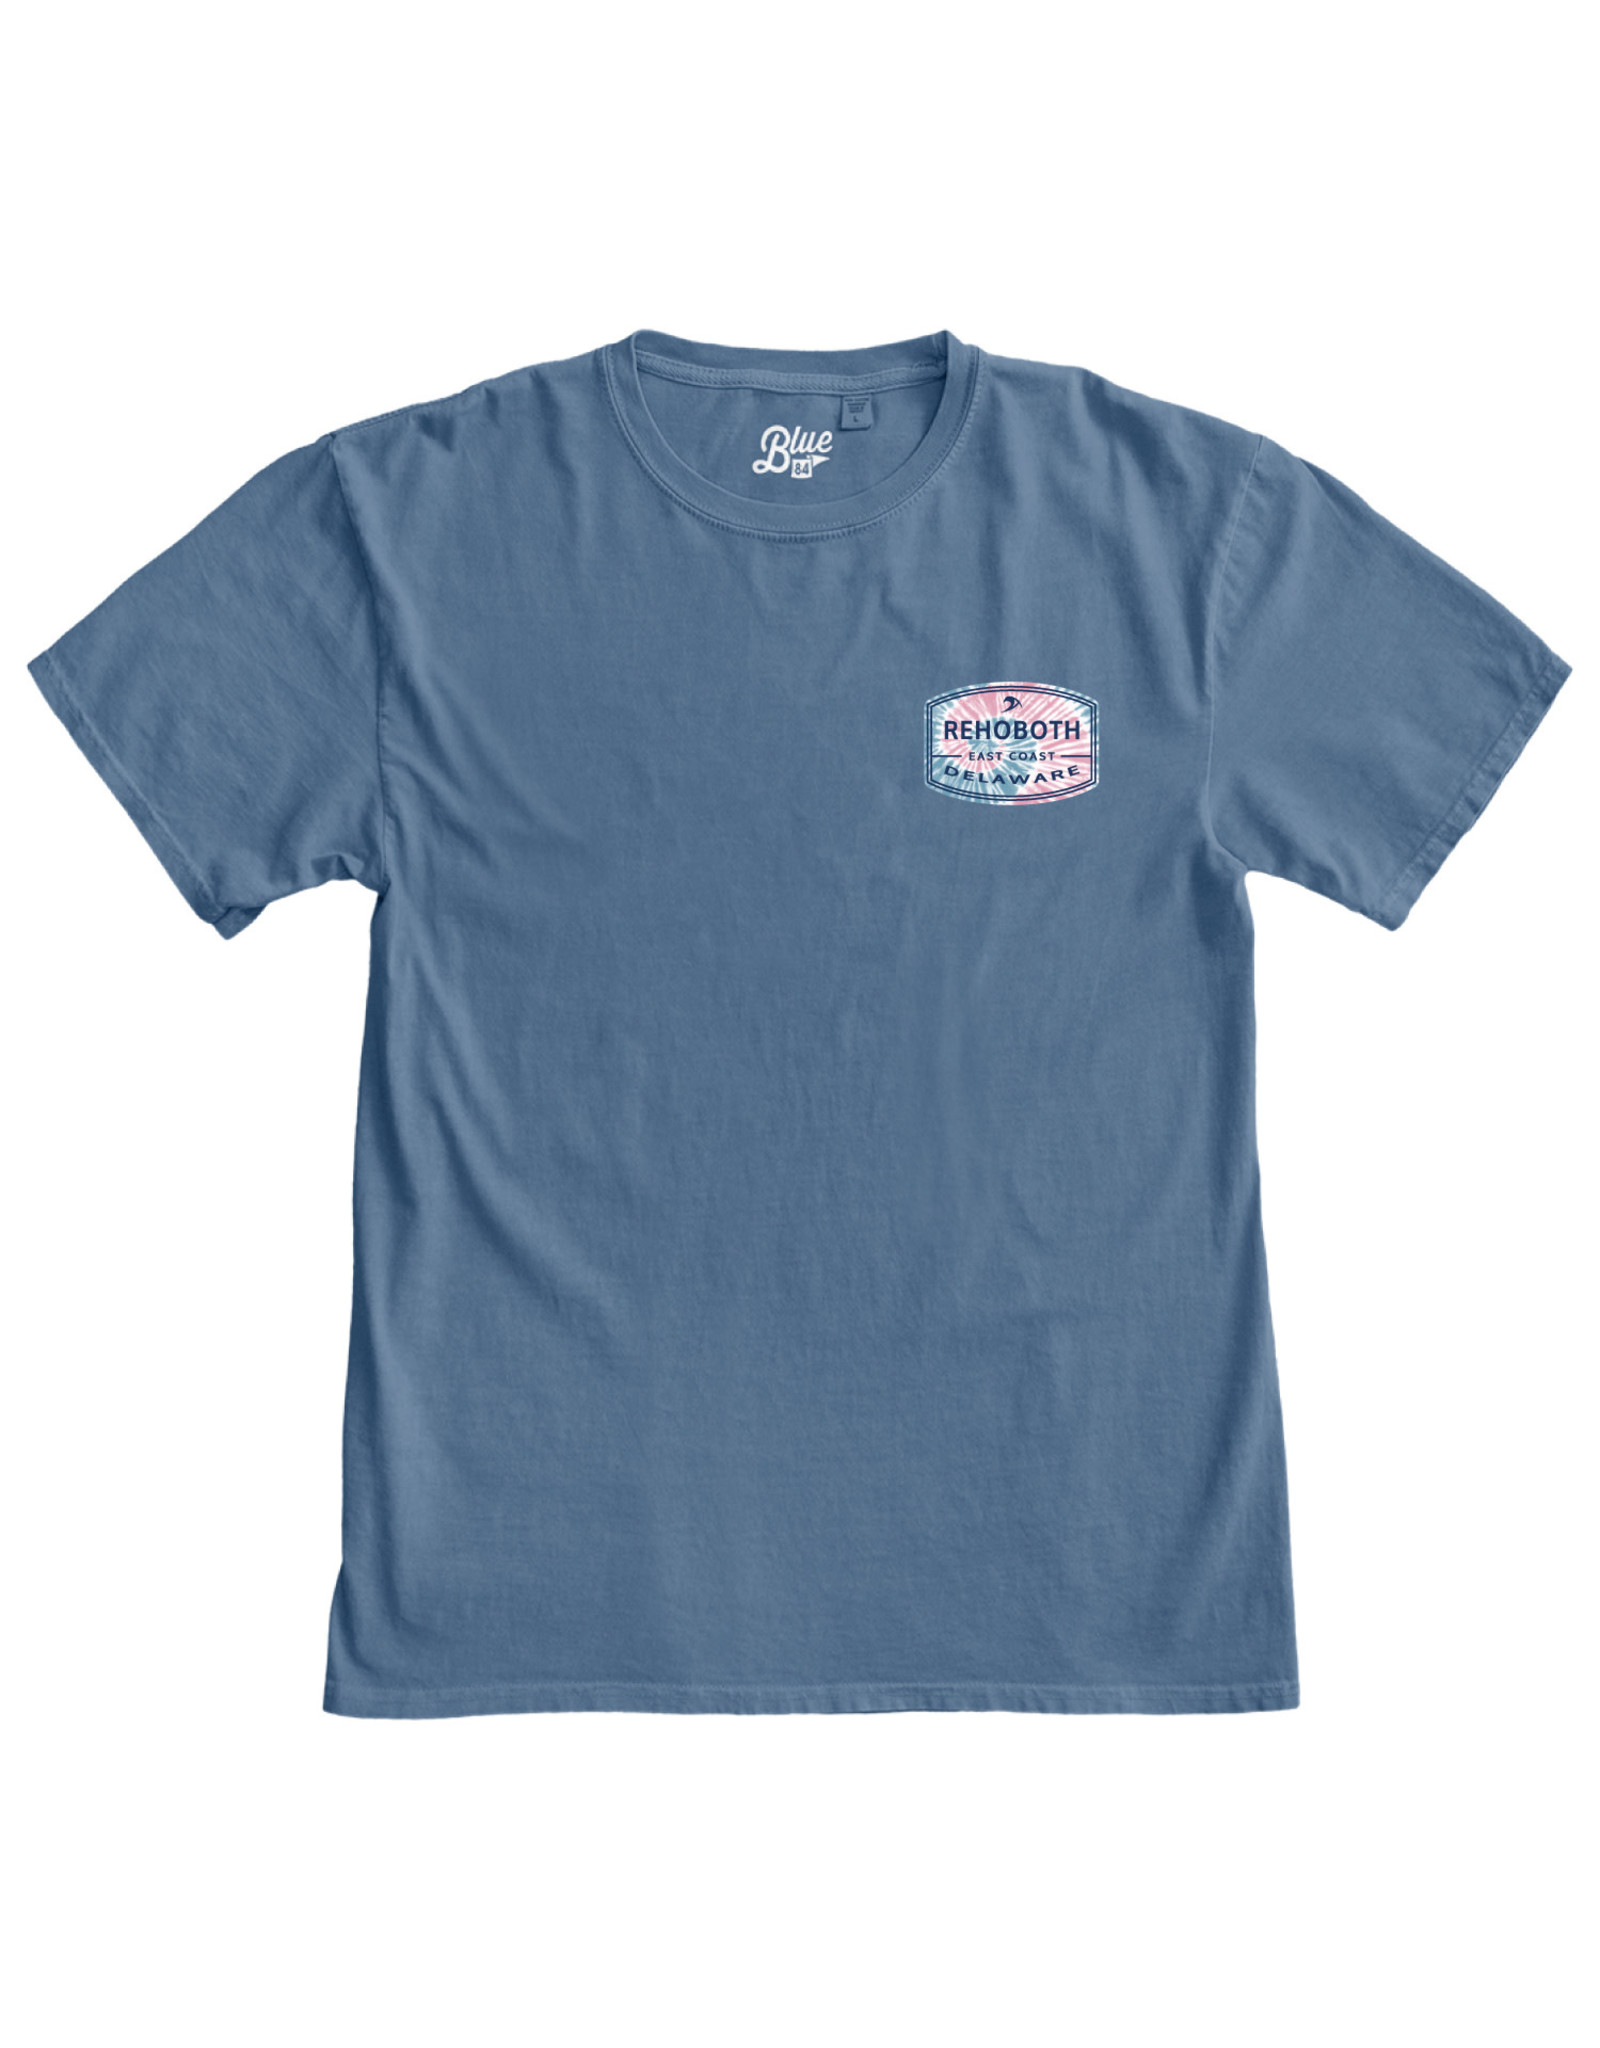 BLUE 84 FRATELLO PINK SWIRL SS TEE